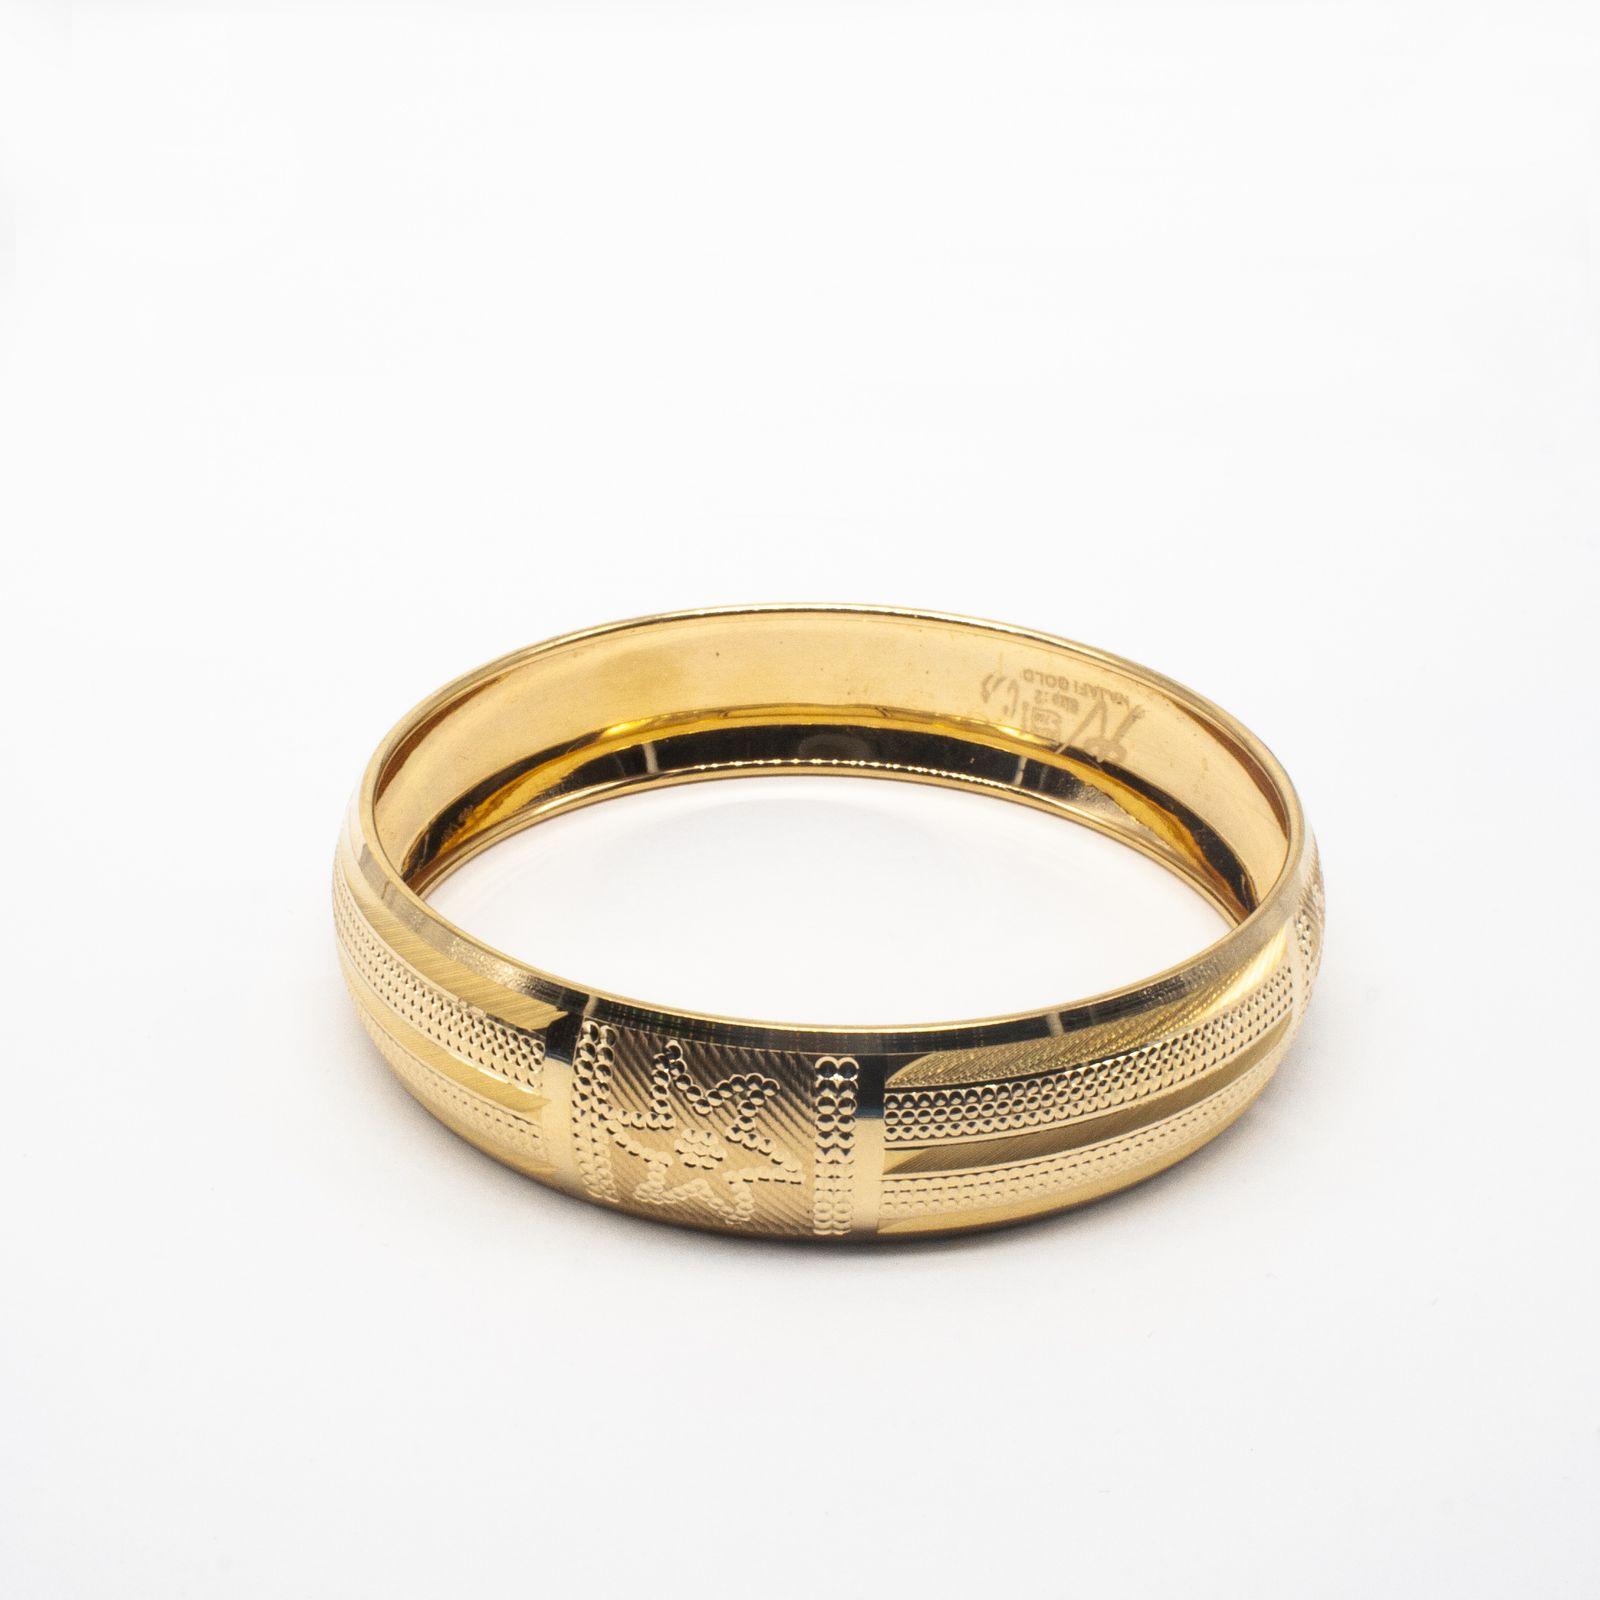 النگو طلا ۱۸ عیار زنانه دُرج مدل VB06-4 thumb 2 1